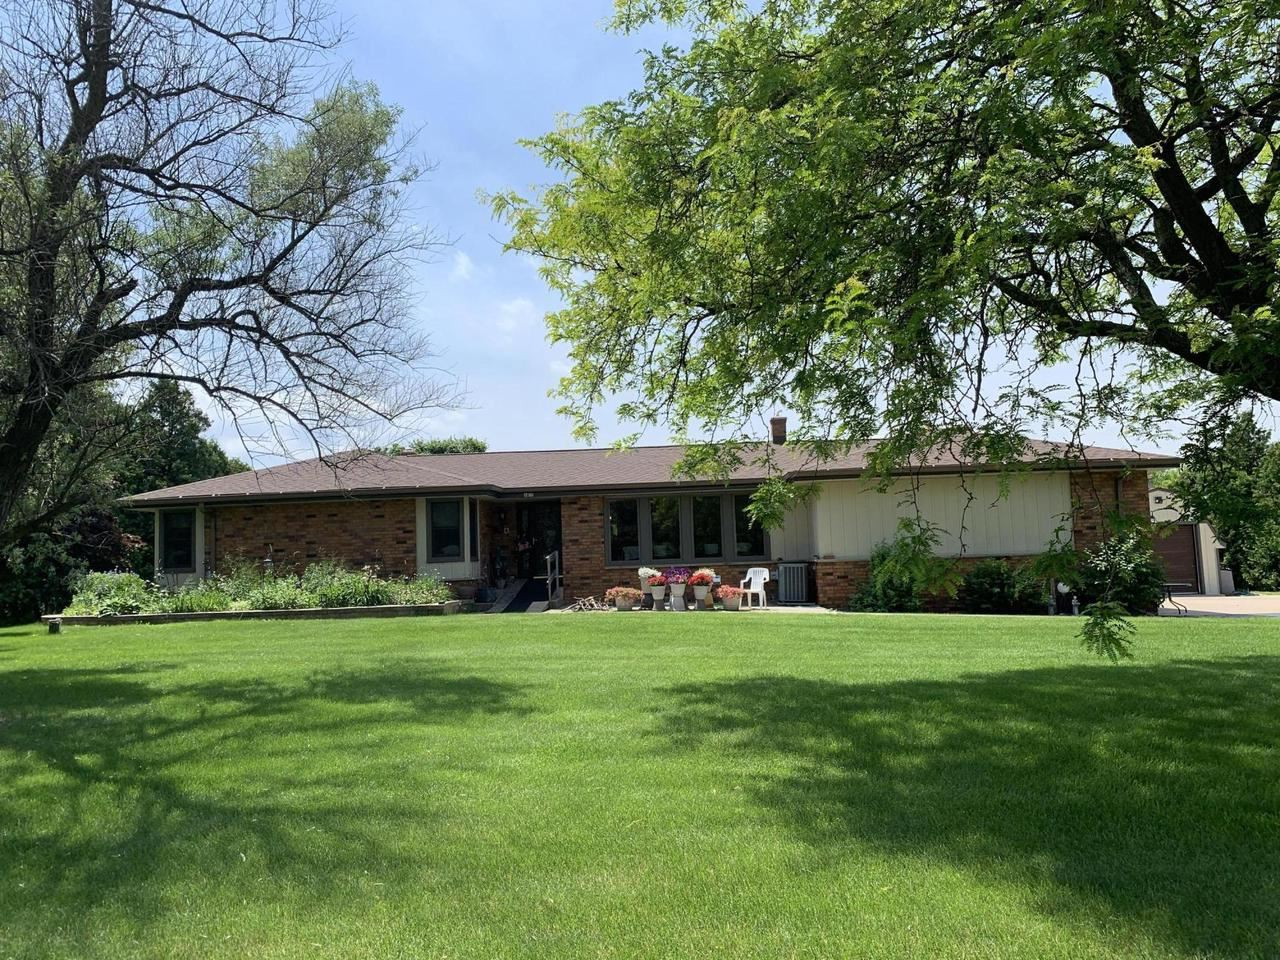 1937 Scenic Rd, Richfield, WI 53076 - MLS#: 1686386